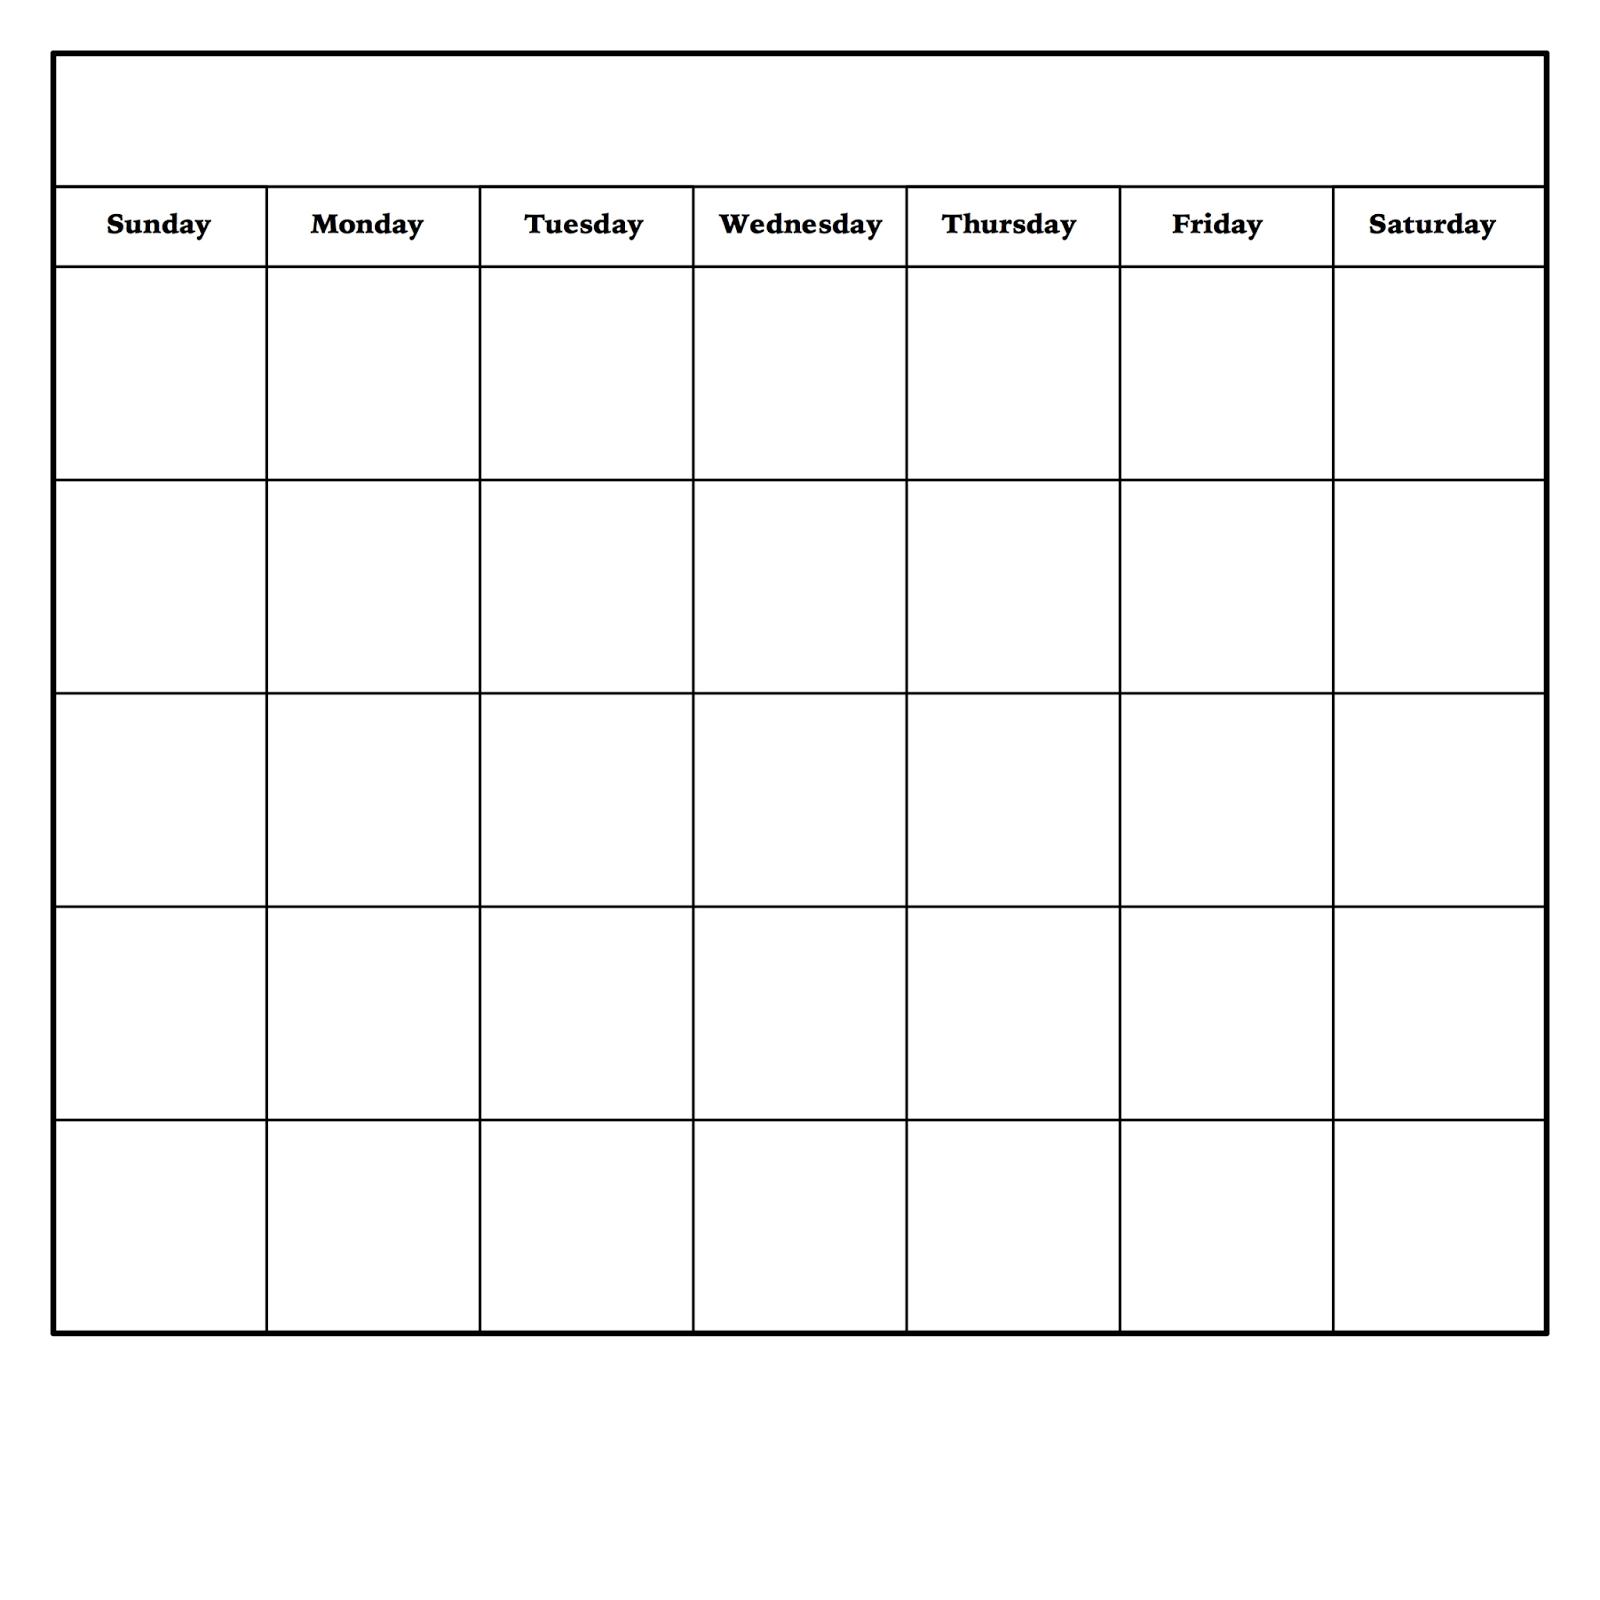 Blank Monday Through Friday Pdf | Calendar Template Printable Monday Through Friday Monthly Calendar